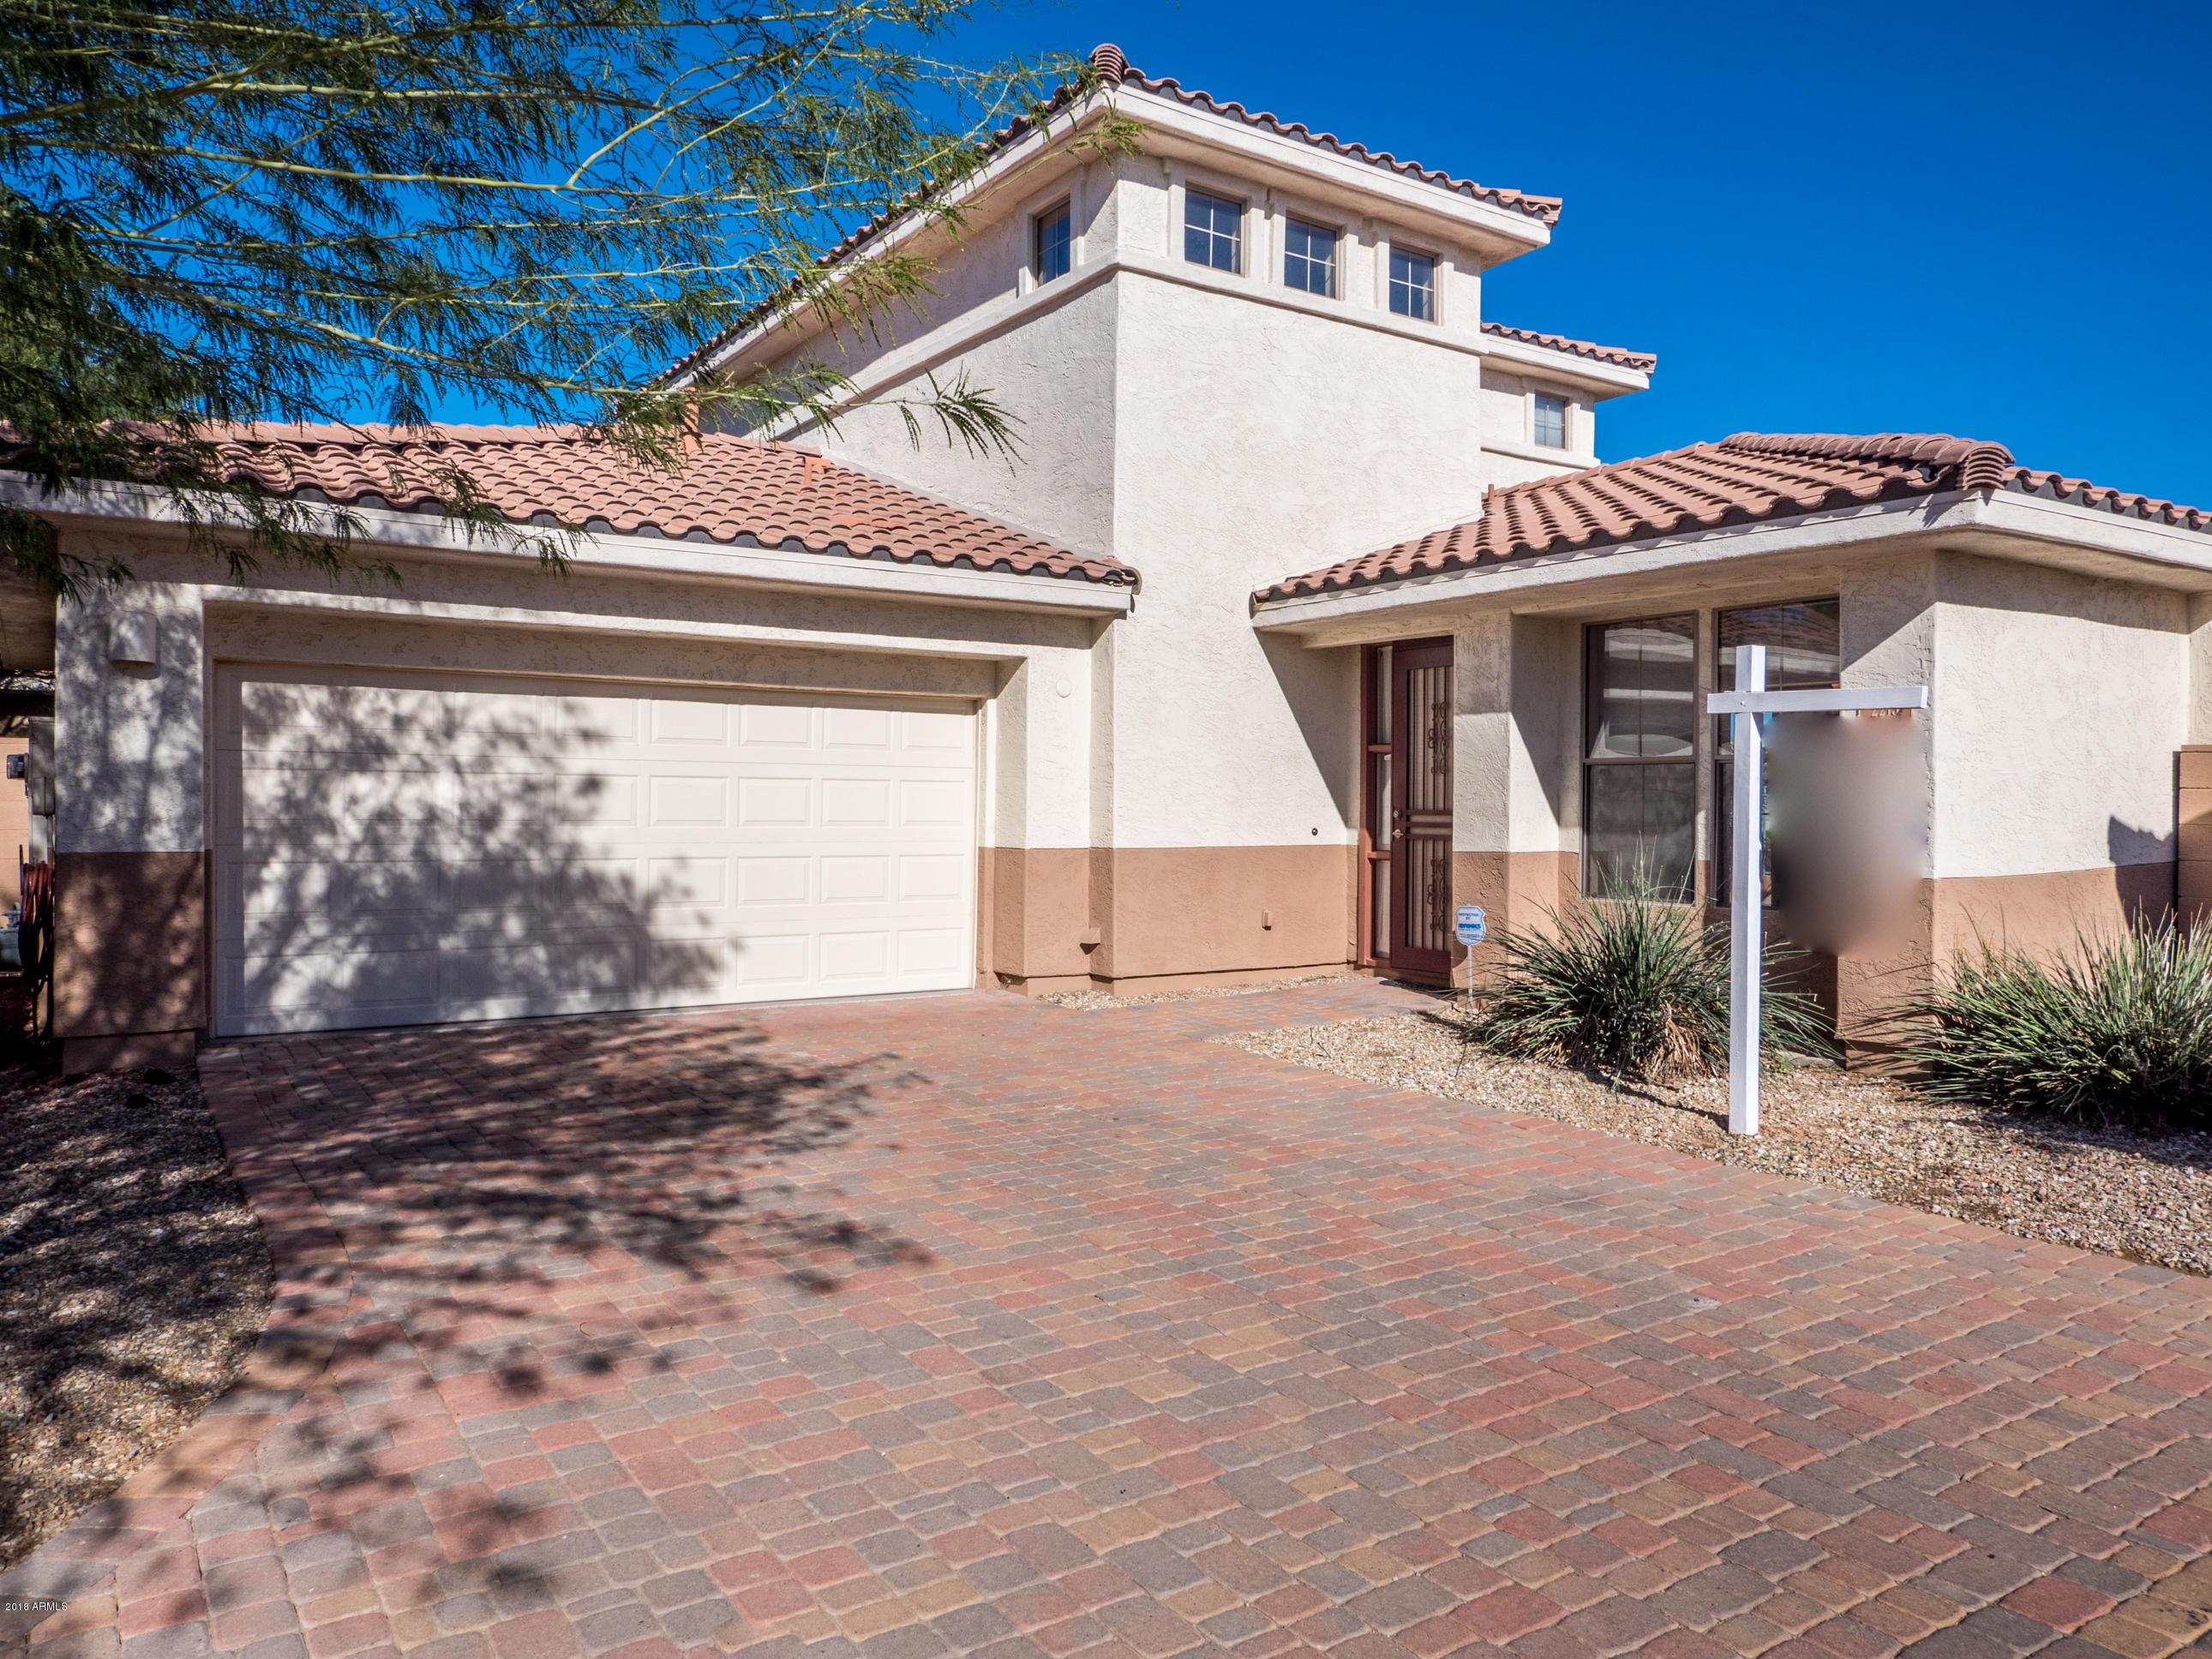 2213 N 135TH Drive Goodyear, AZ 85395 - MLS #: 5713349